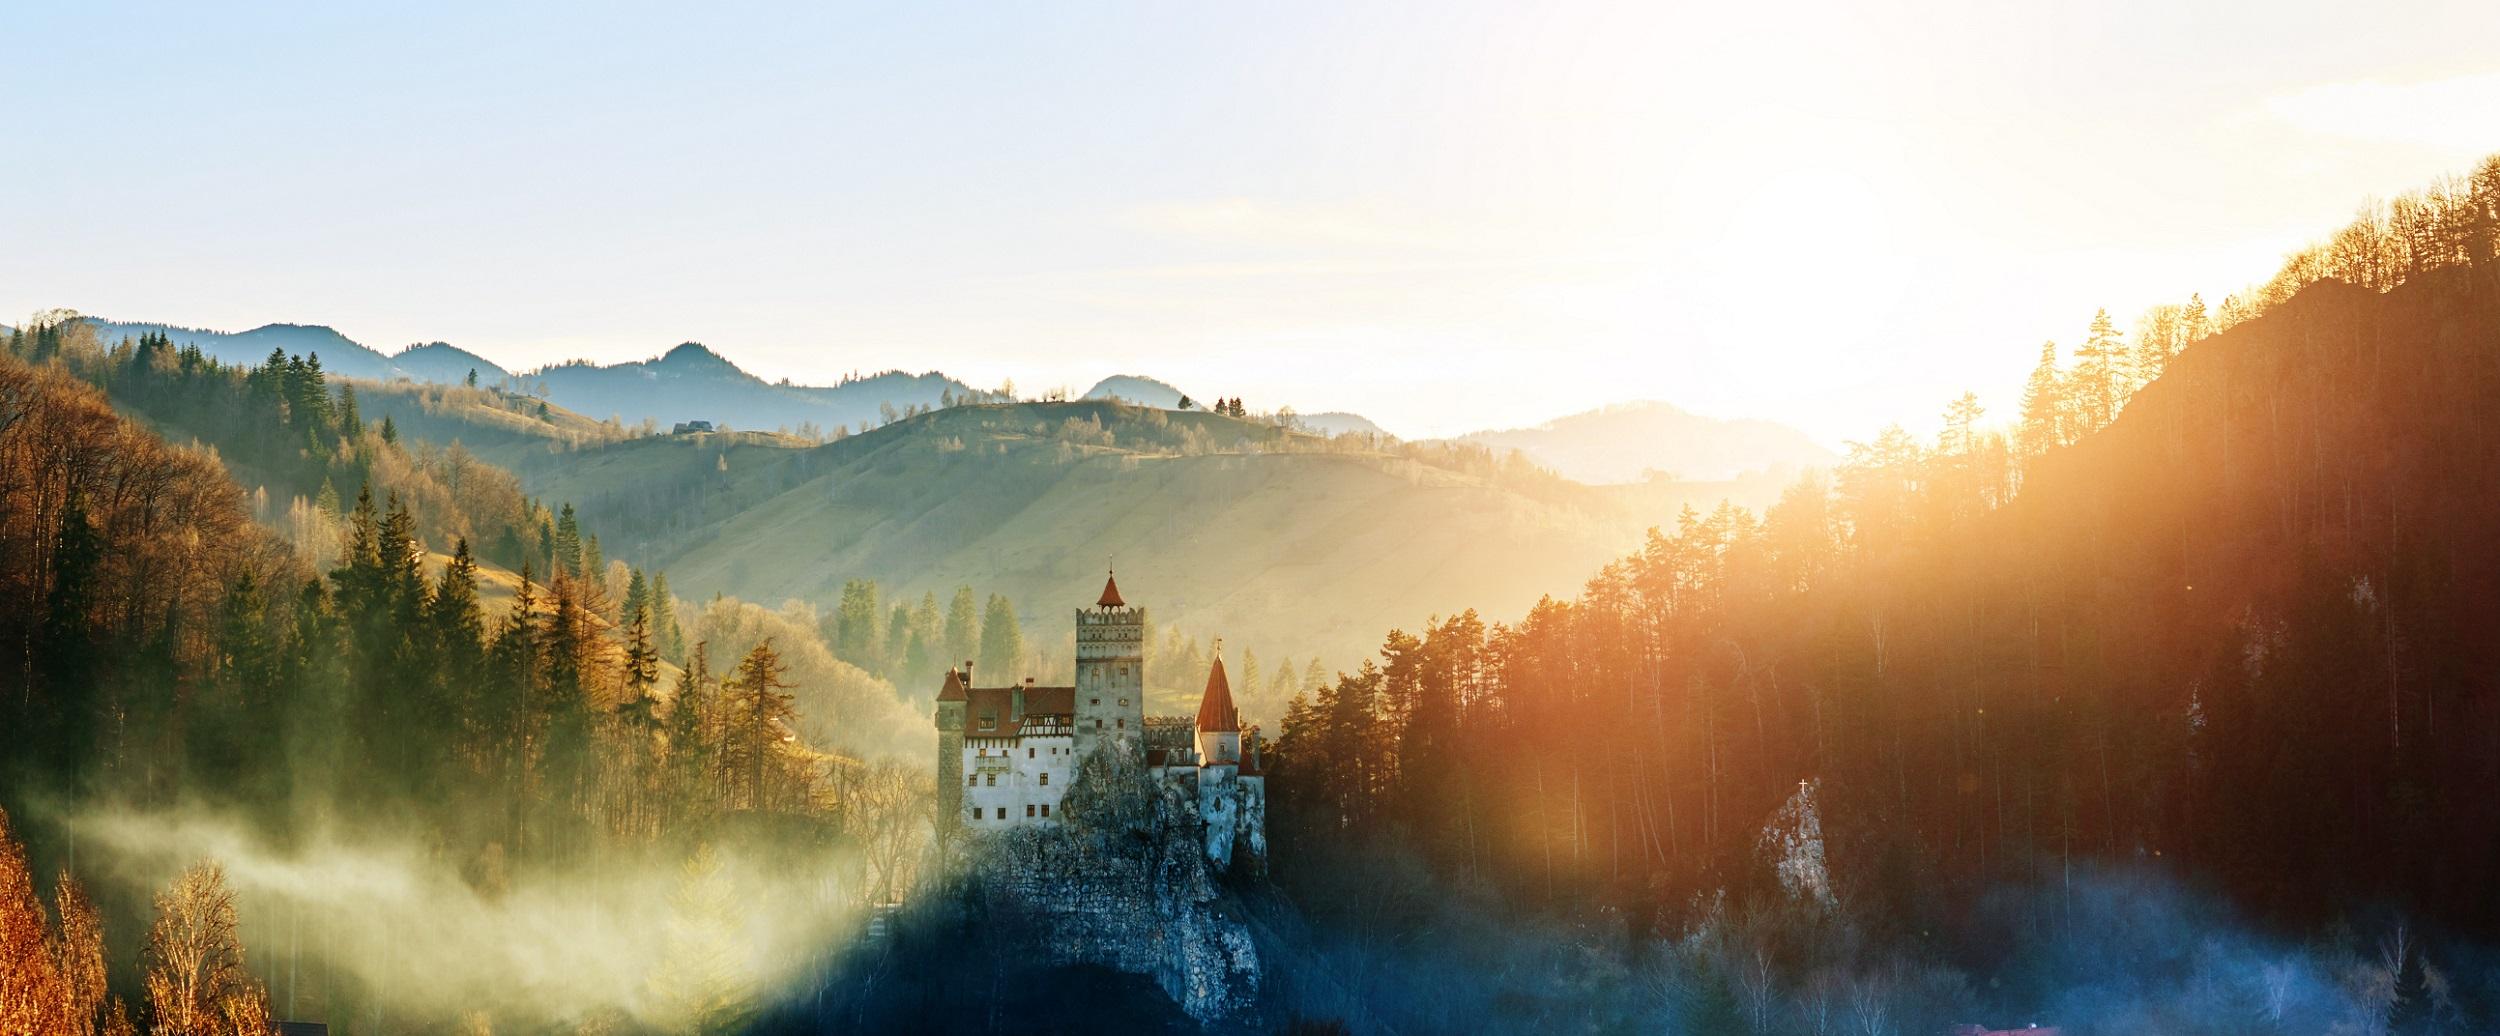 worlds-dreamiest-castles